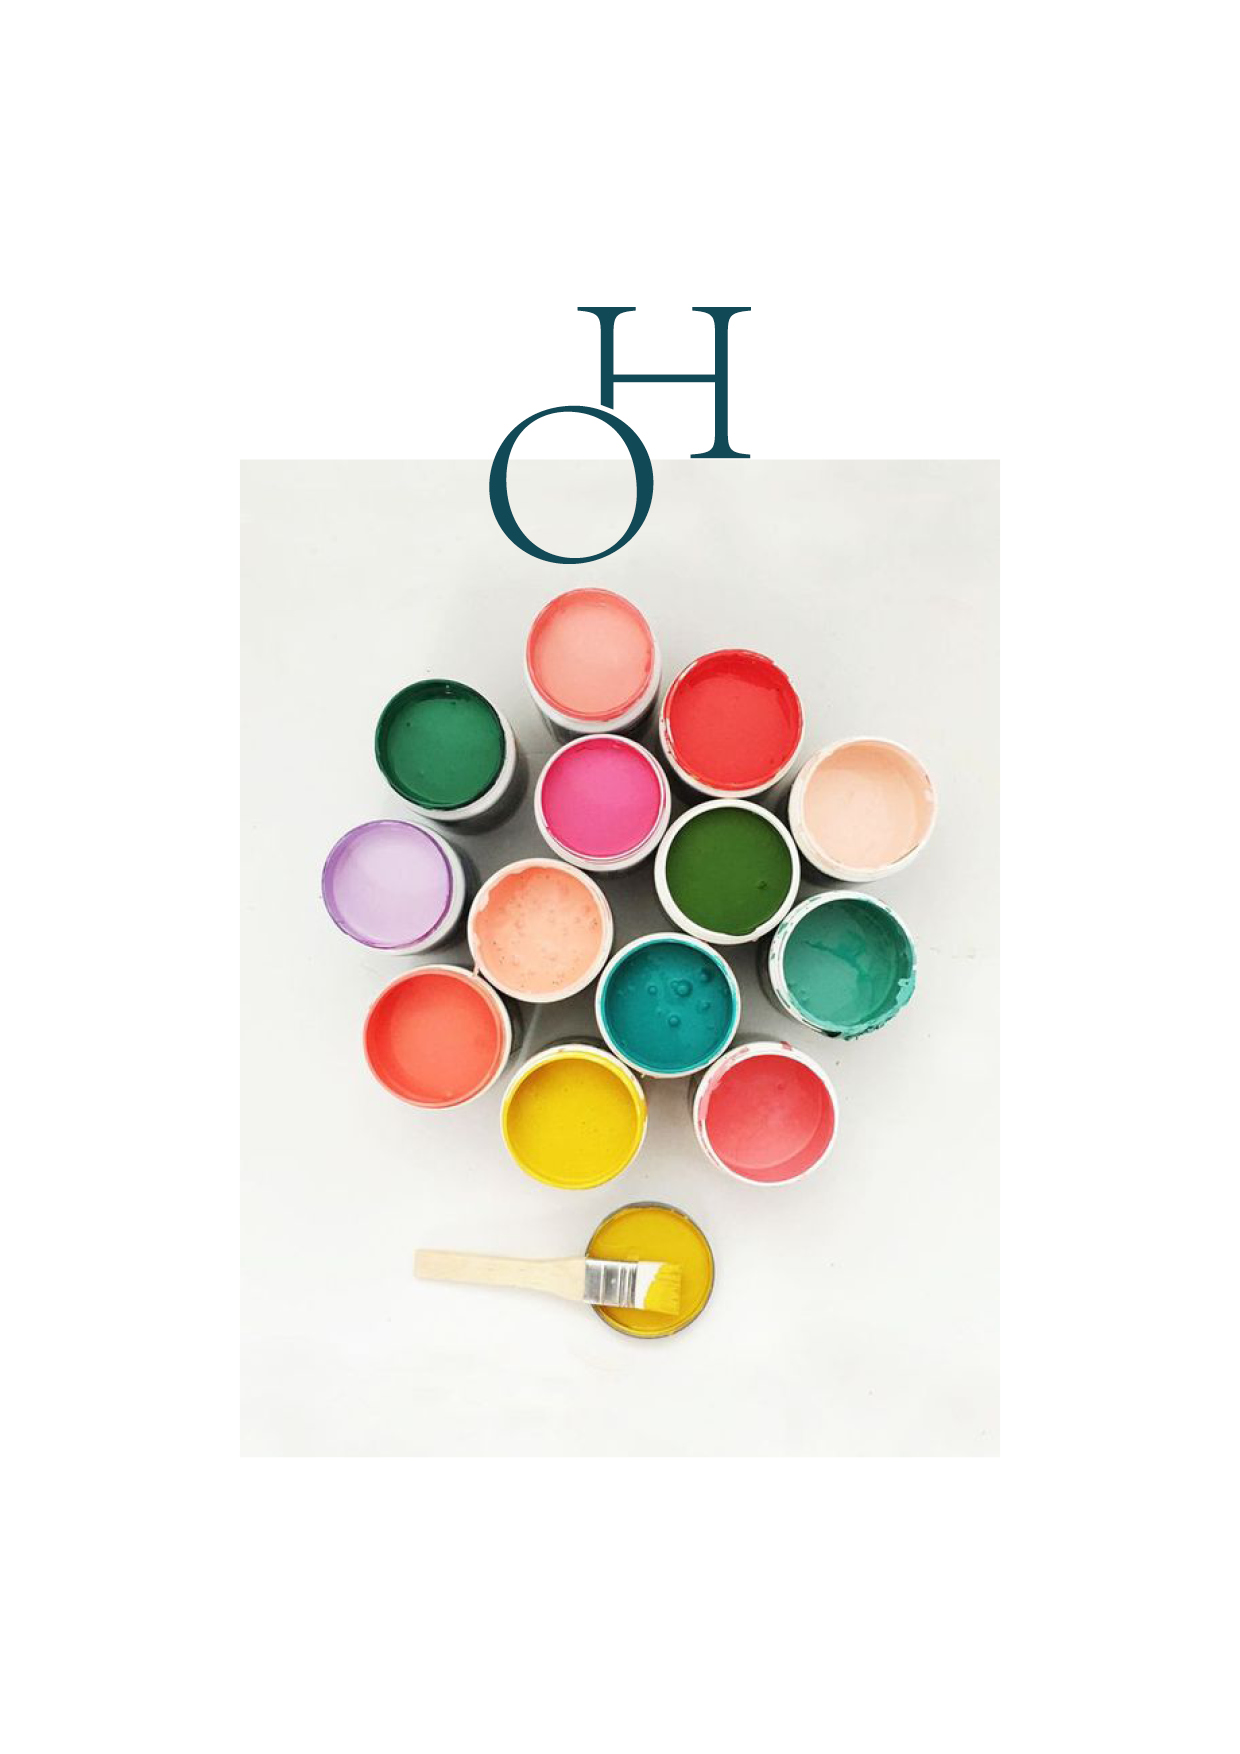 Osborne_Hodge_Hoult_and_Delis_Graphic_design_studio_branding.jpg